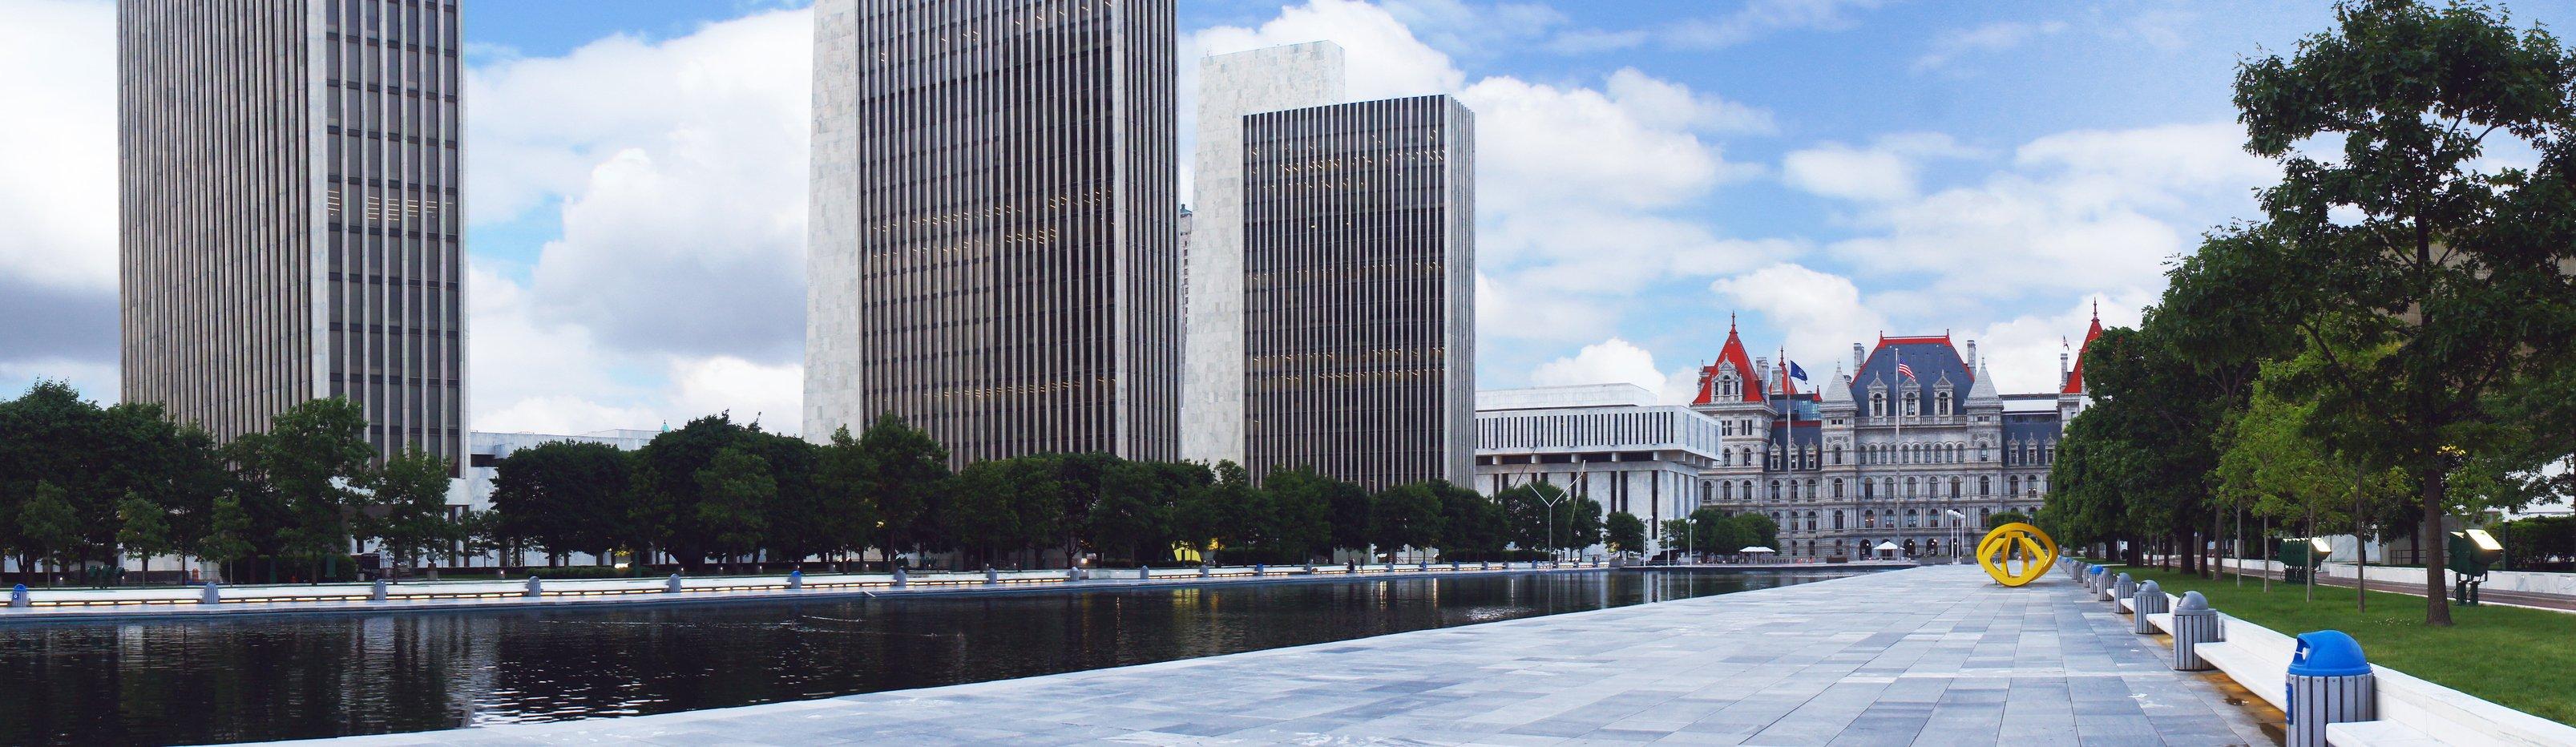 New-York-Capitol-Albany-Semester